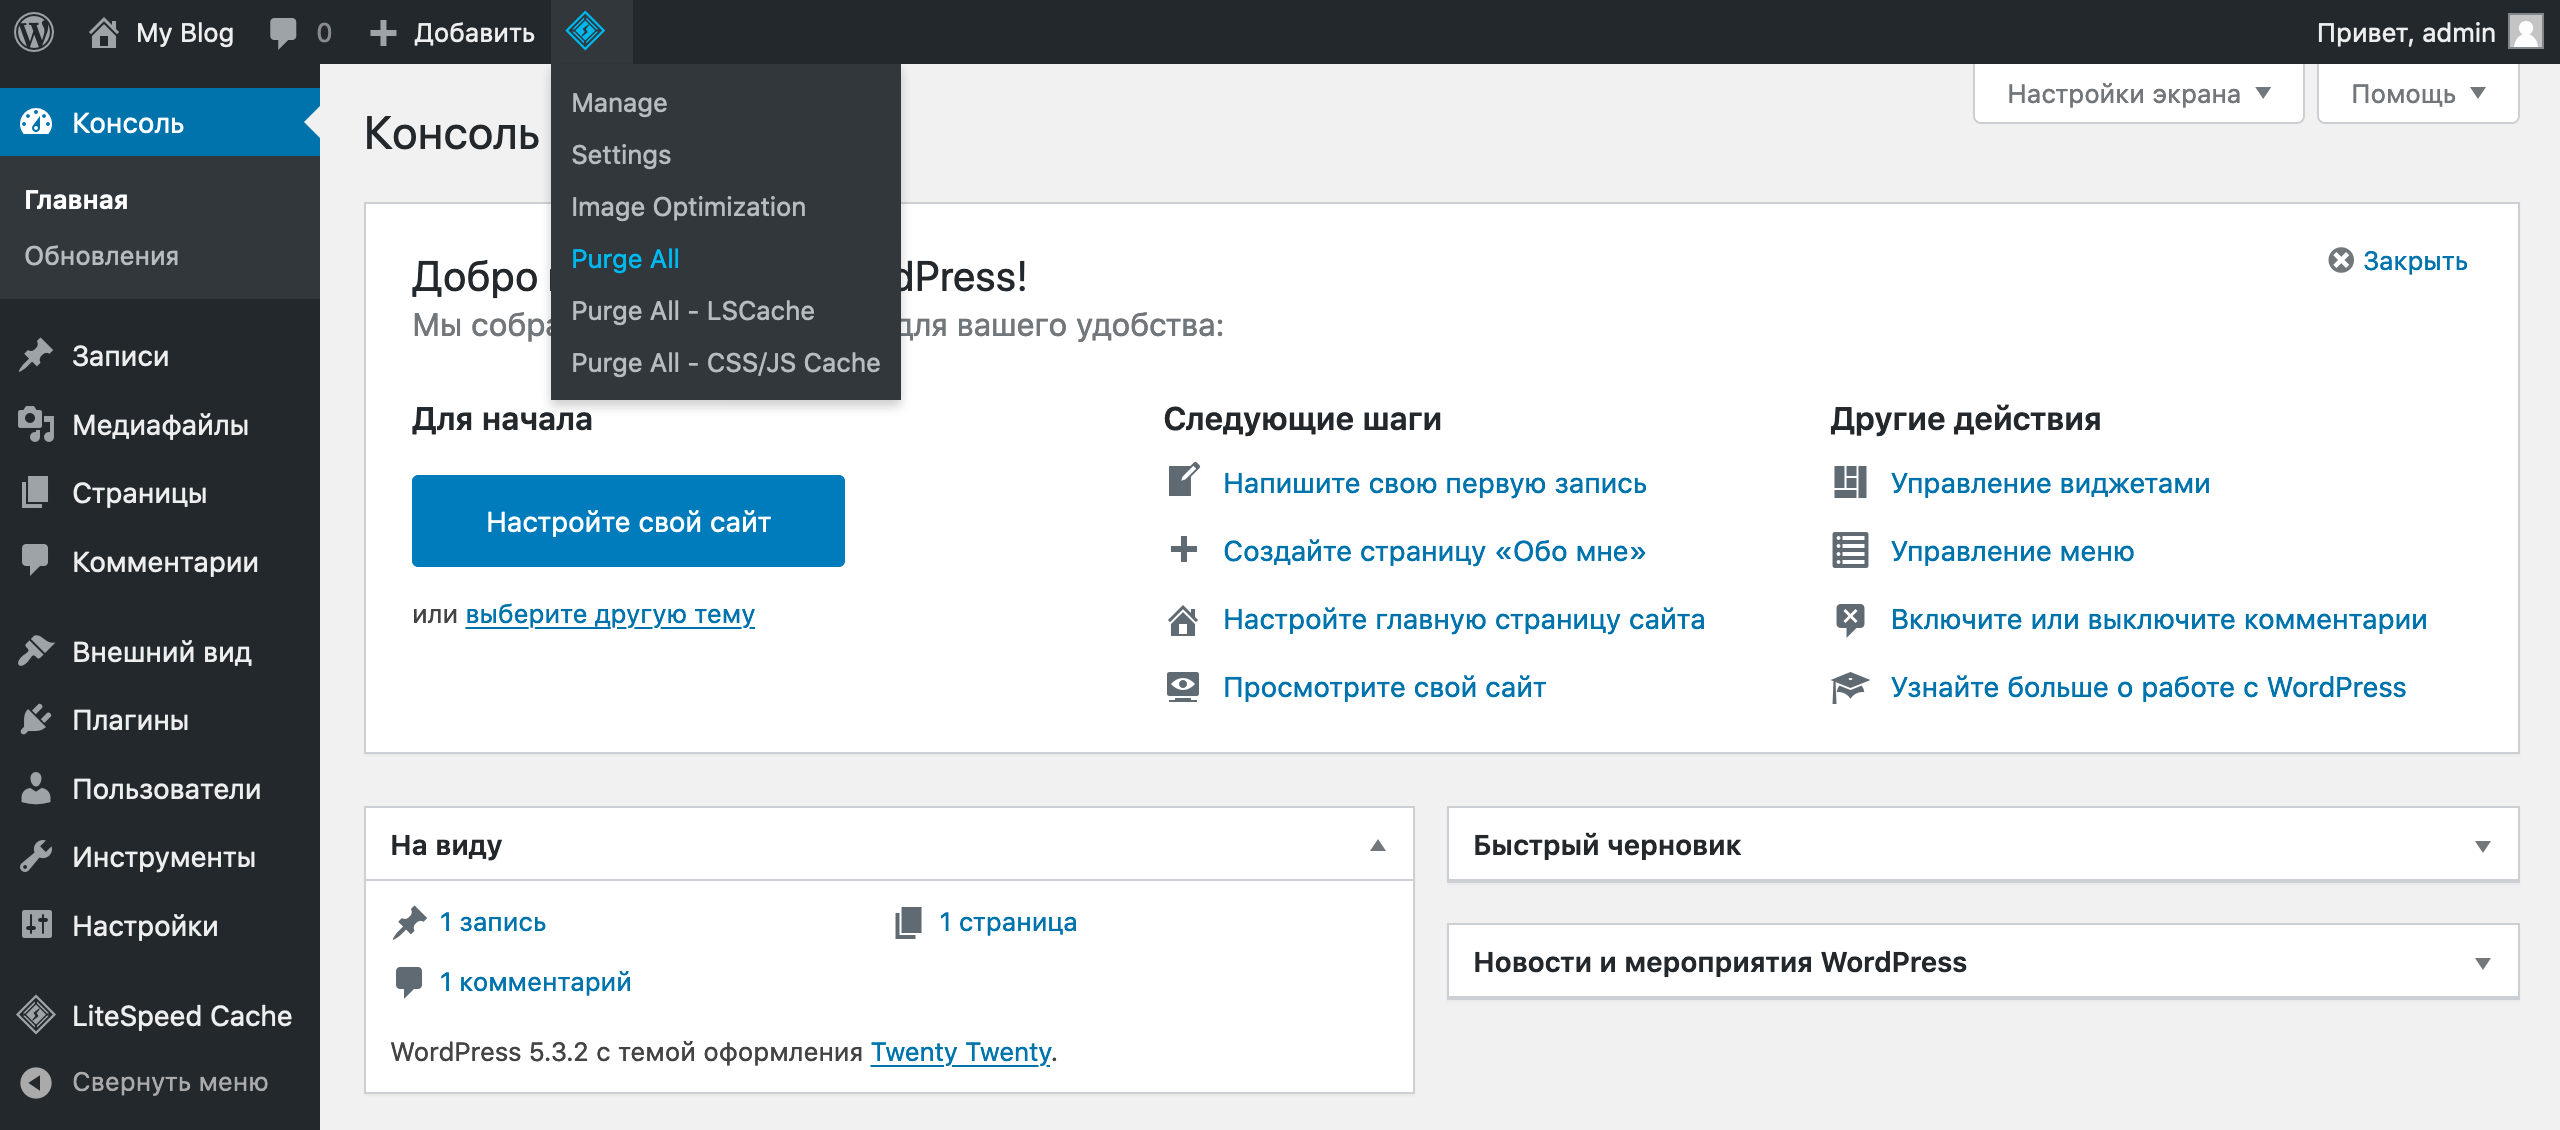 Управление LiteSpeed Cache при помощи ярлыка на панели администратора сайта